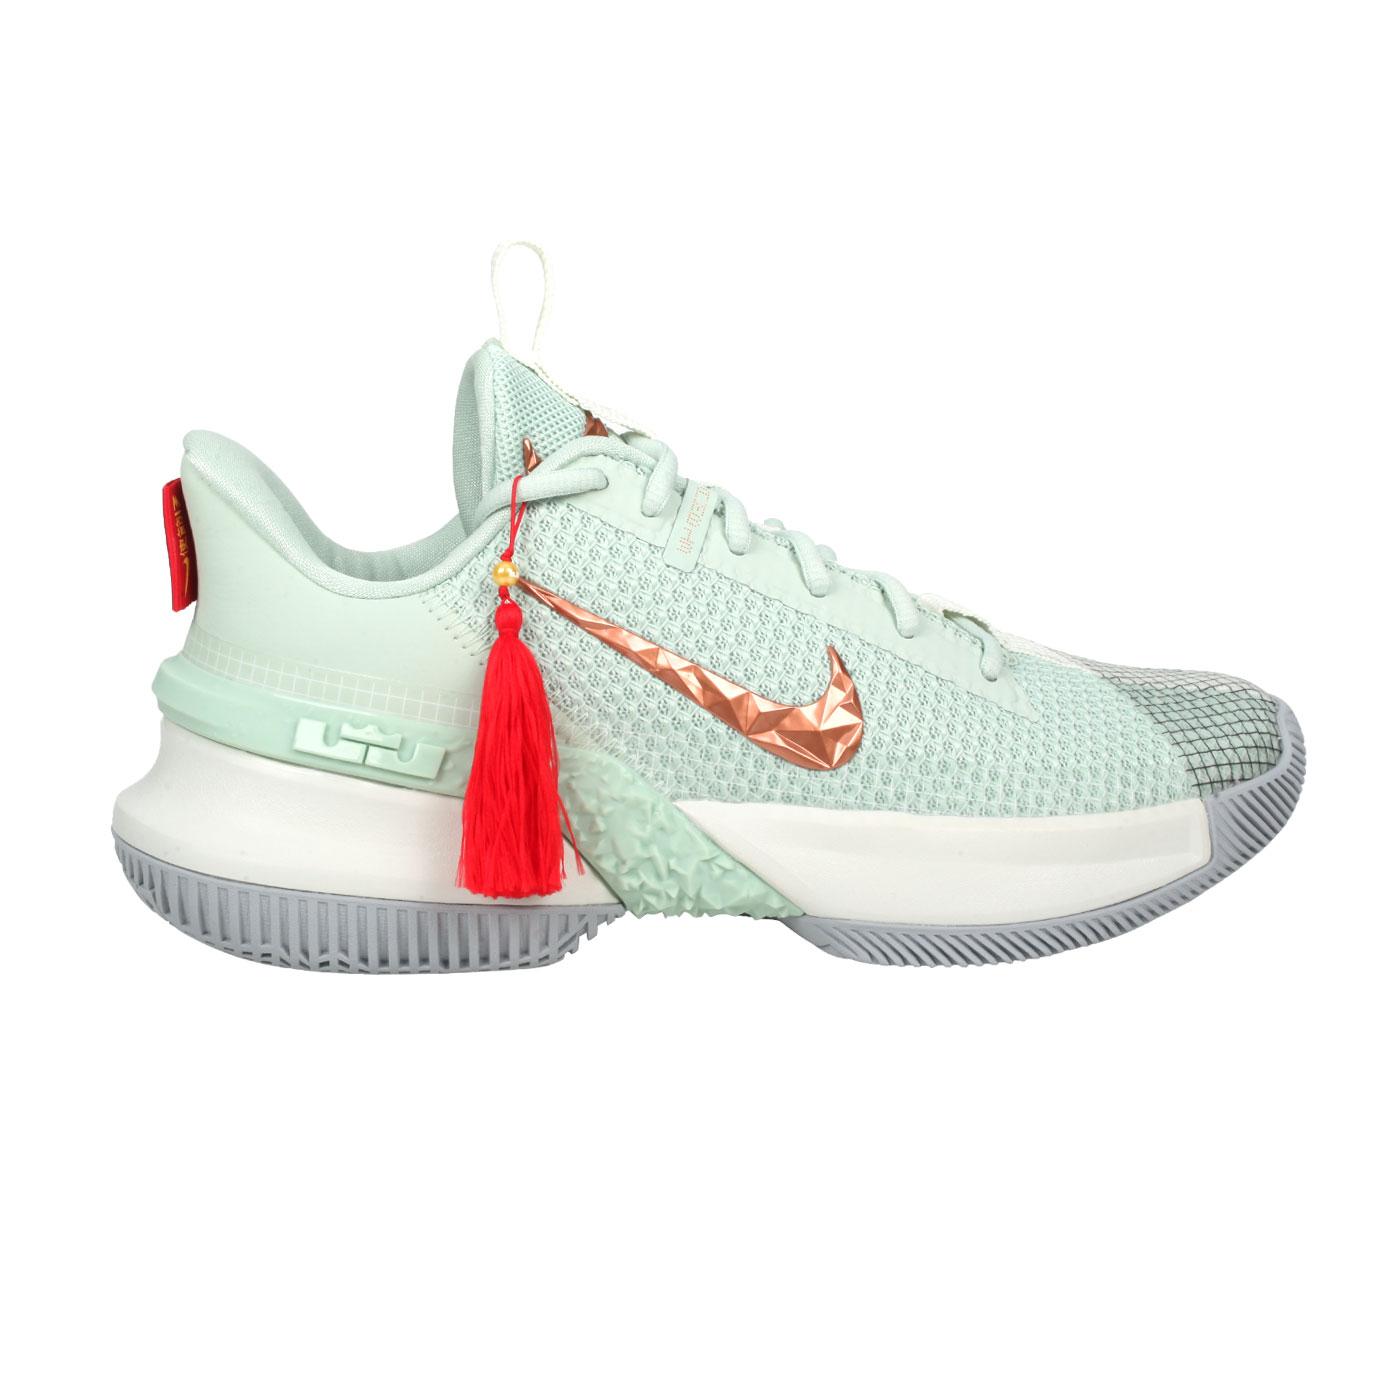 NIKE 限量-男款籃球鞋  @AMBASSADOR XIII@CQ9329300 - 果綠咖啡金